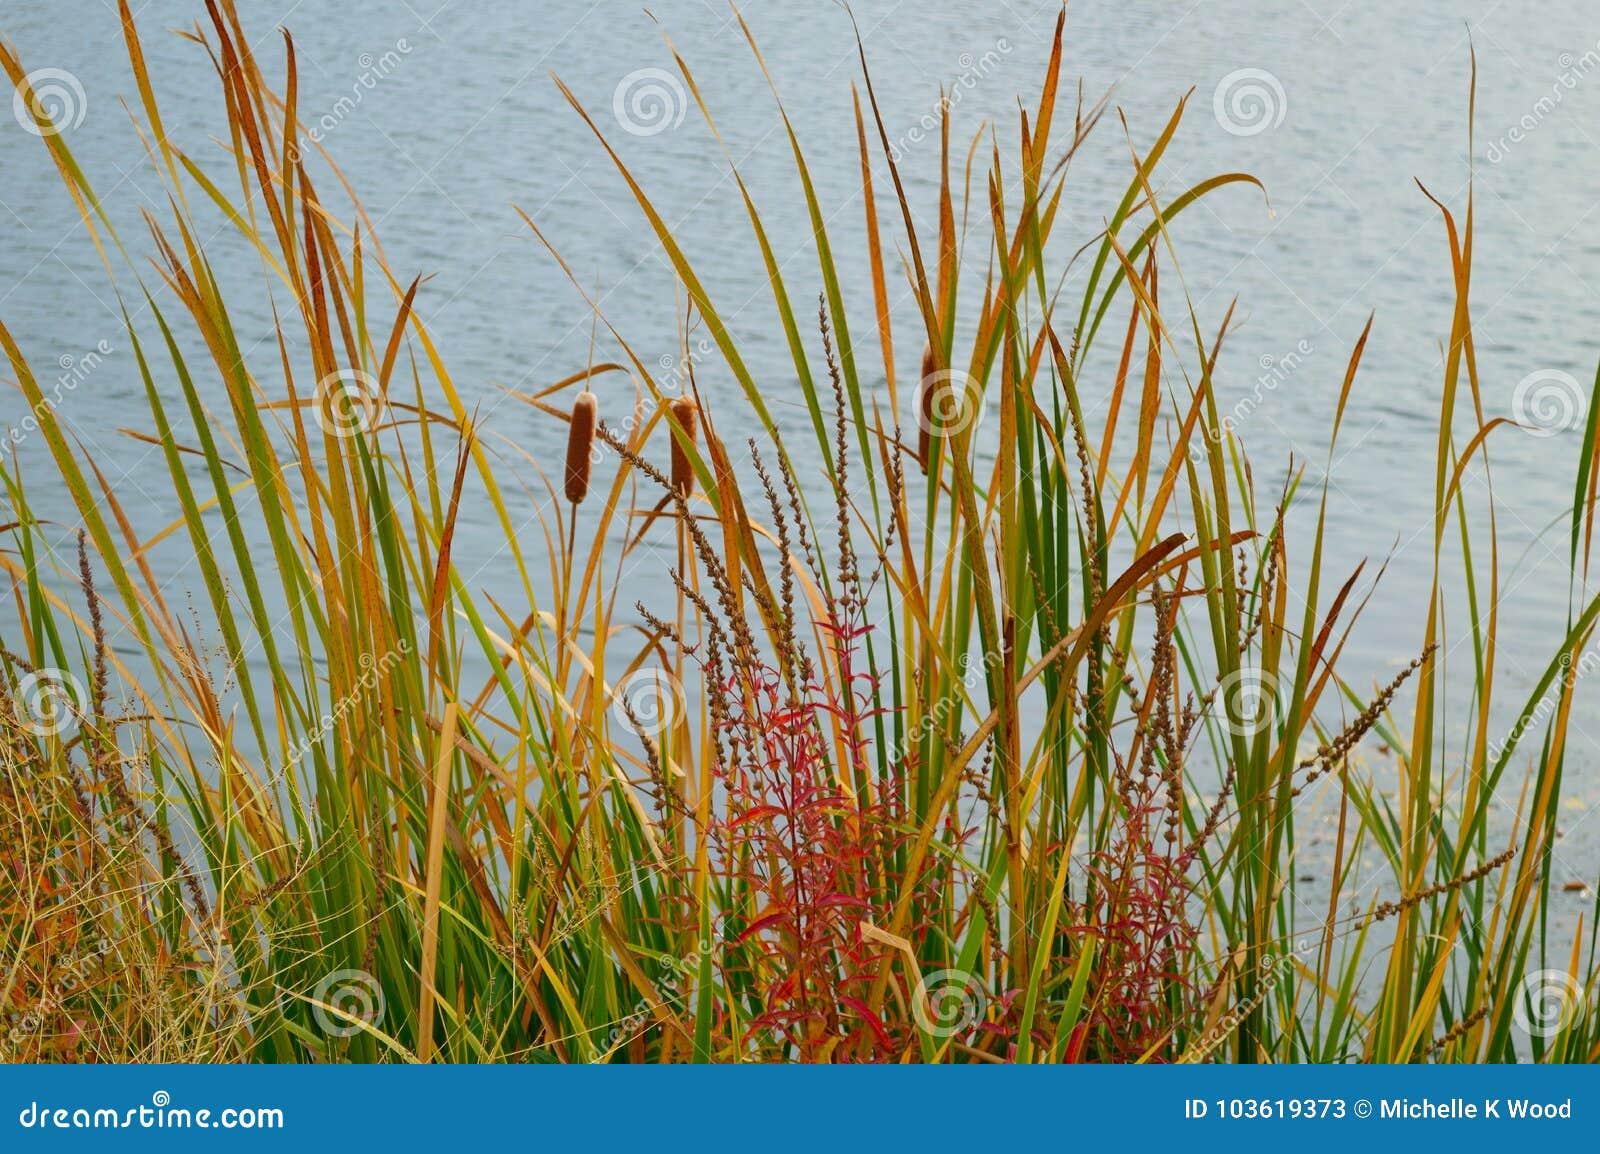 Cattails Reeds Grasses Boise Cascade Lake